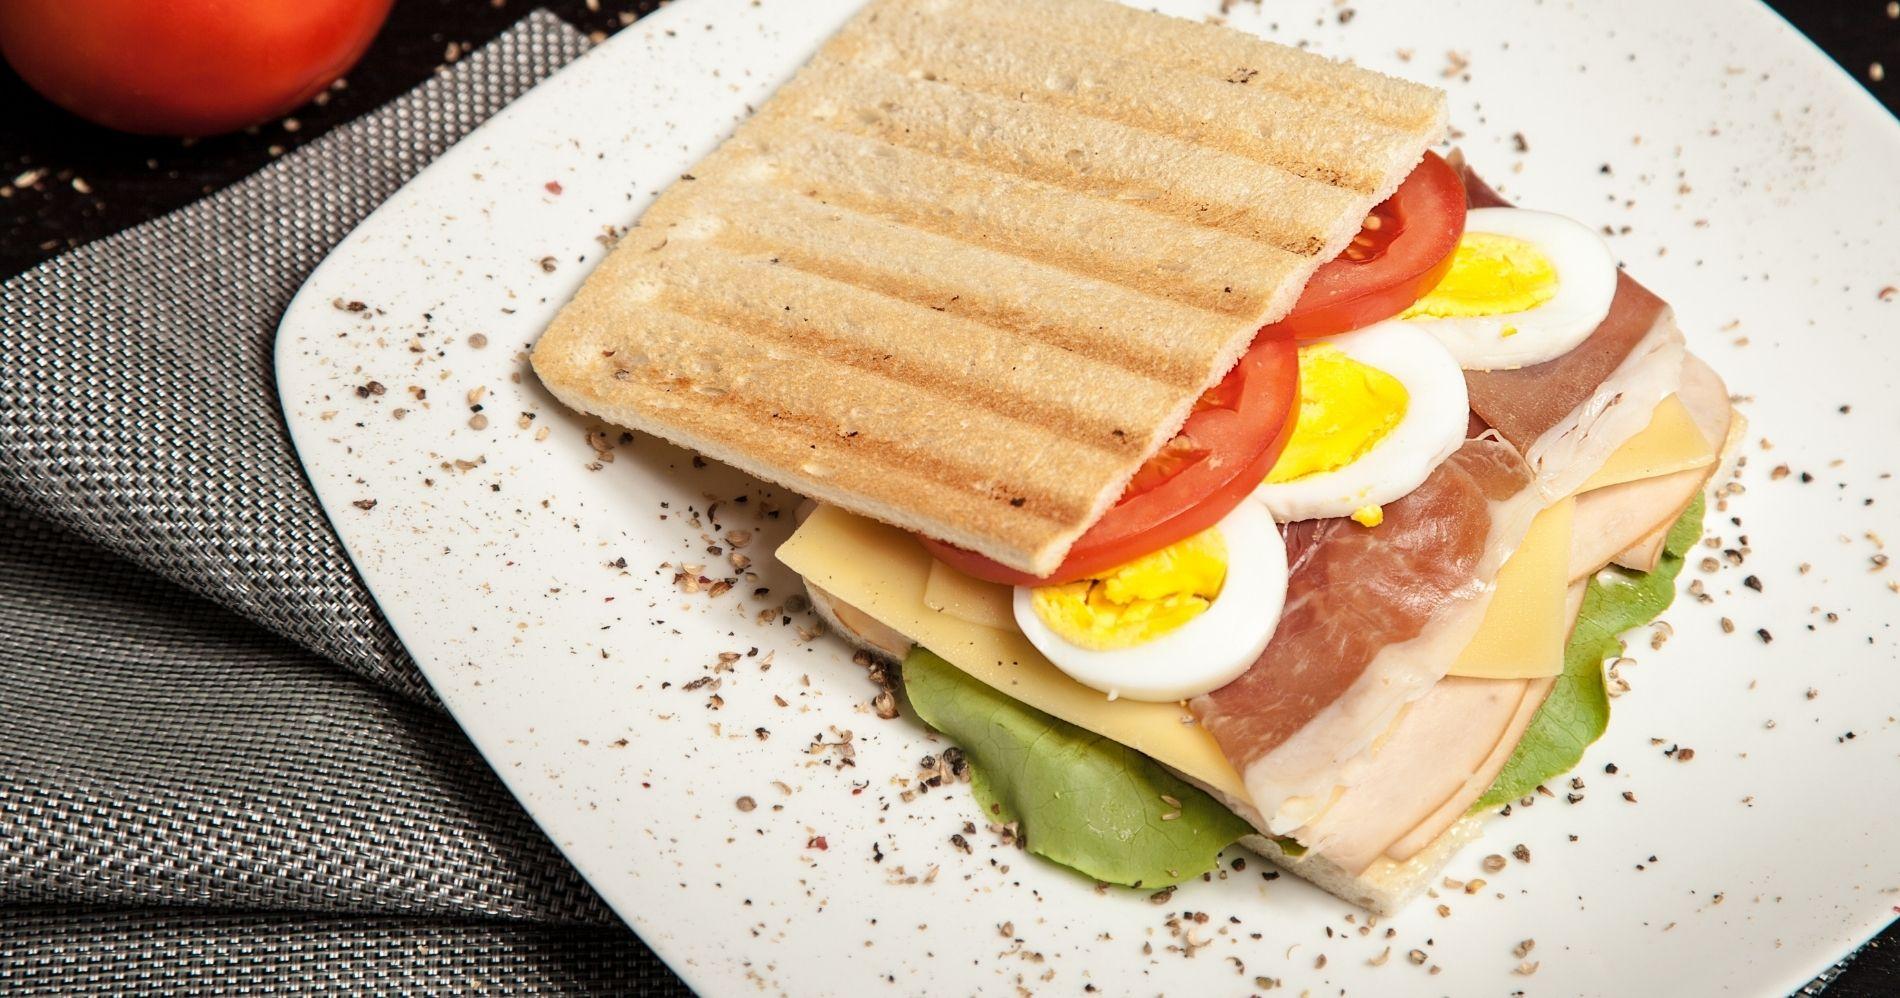 Generasi Sandwich Illustration Web Bisnis Muda - Image: Canva